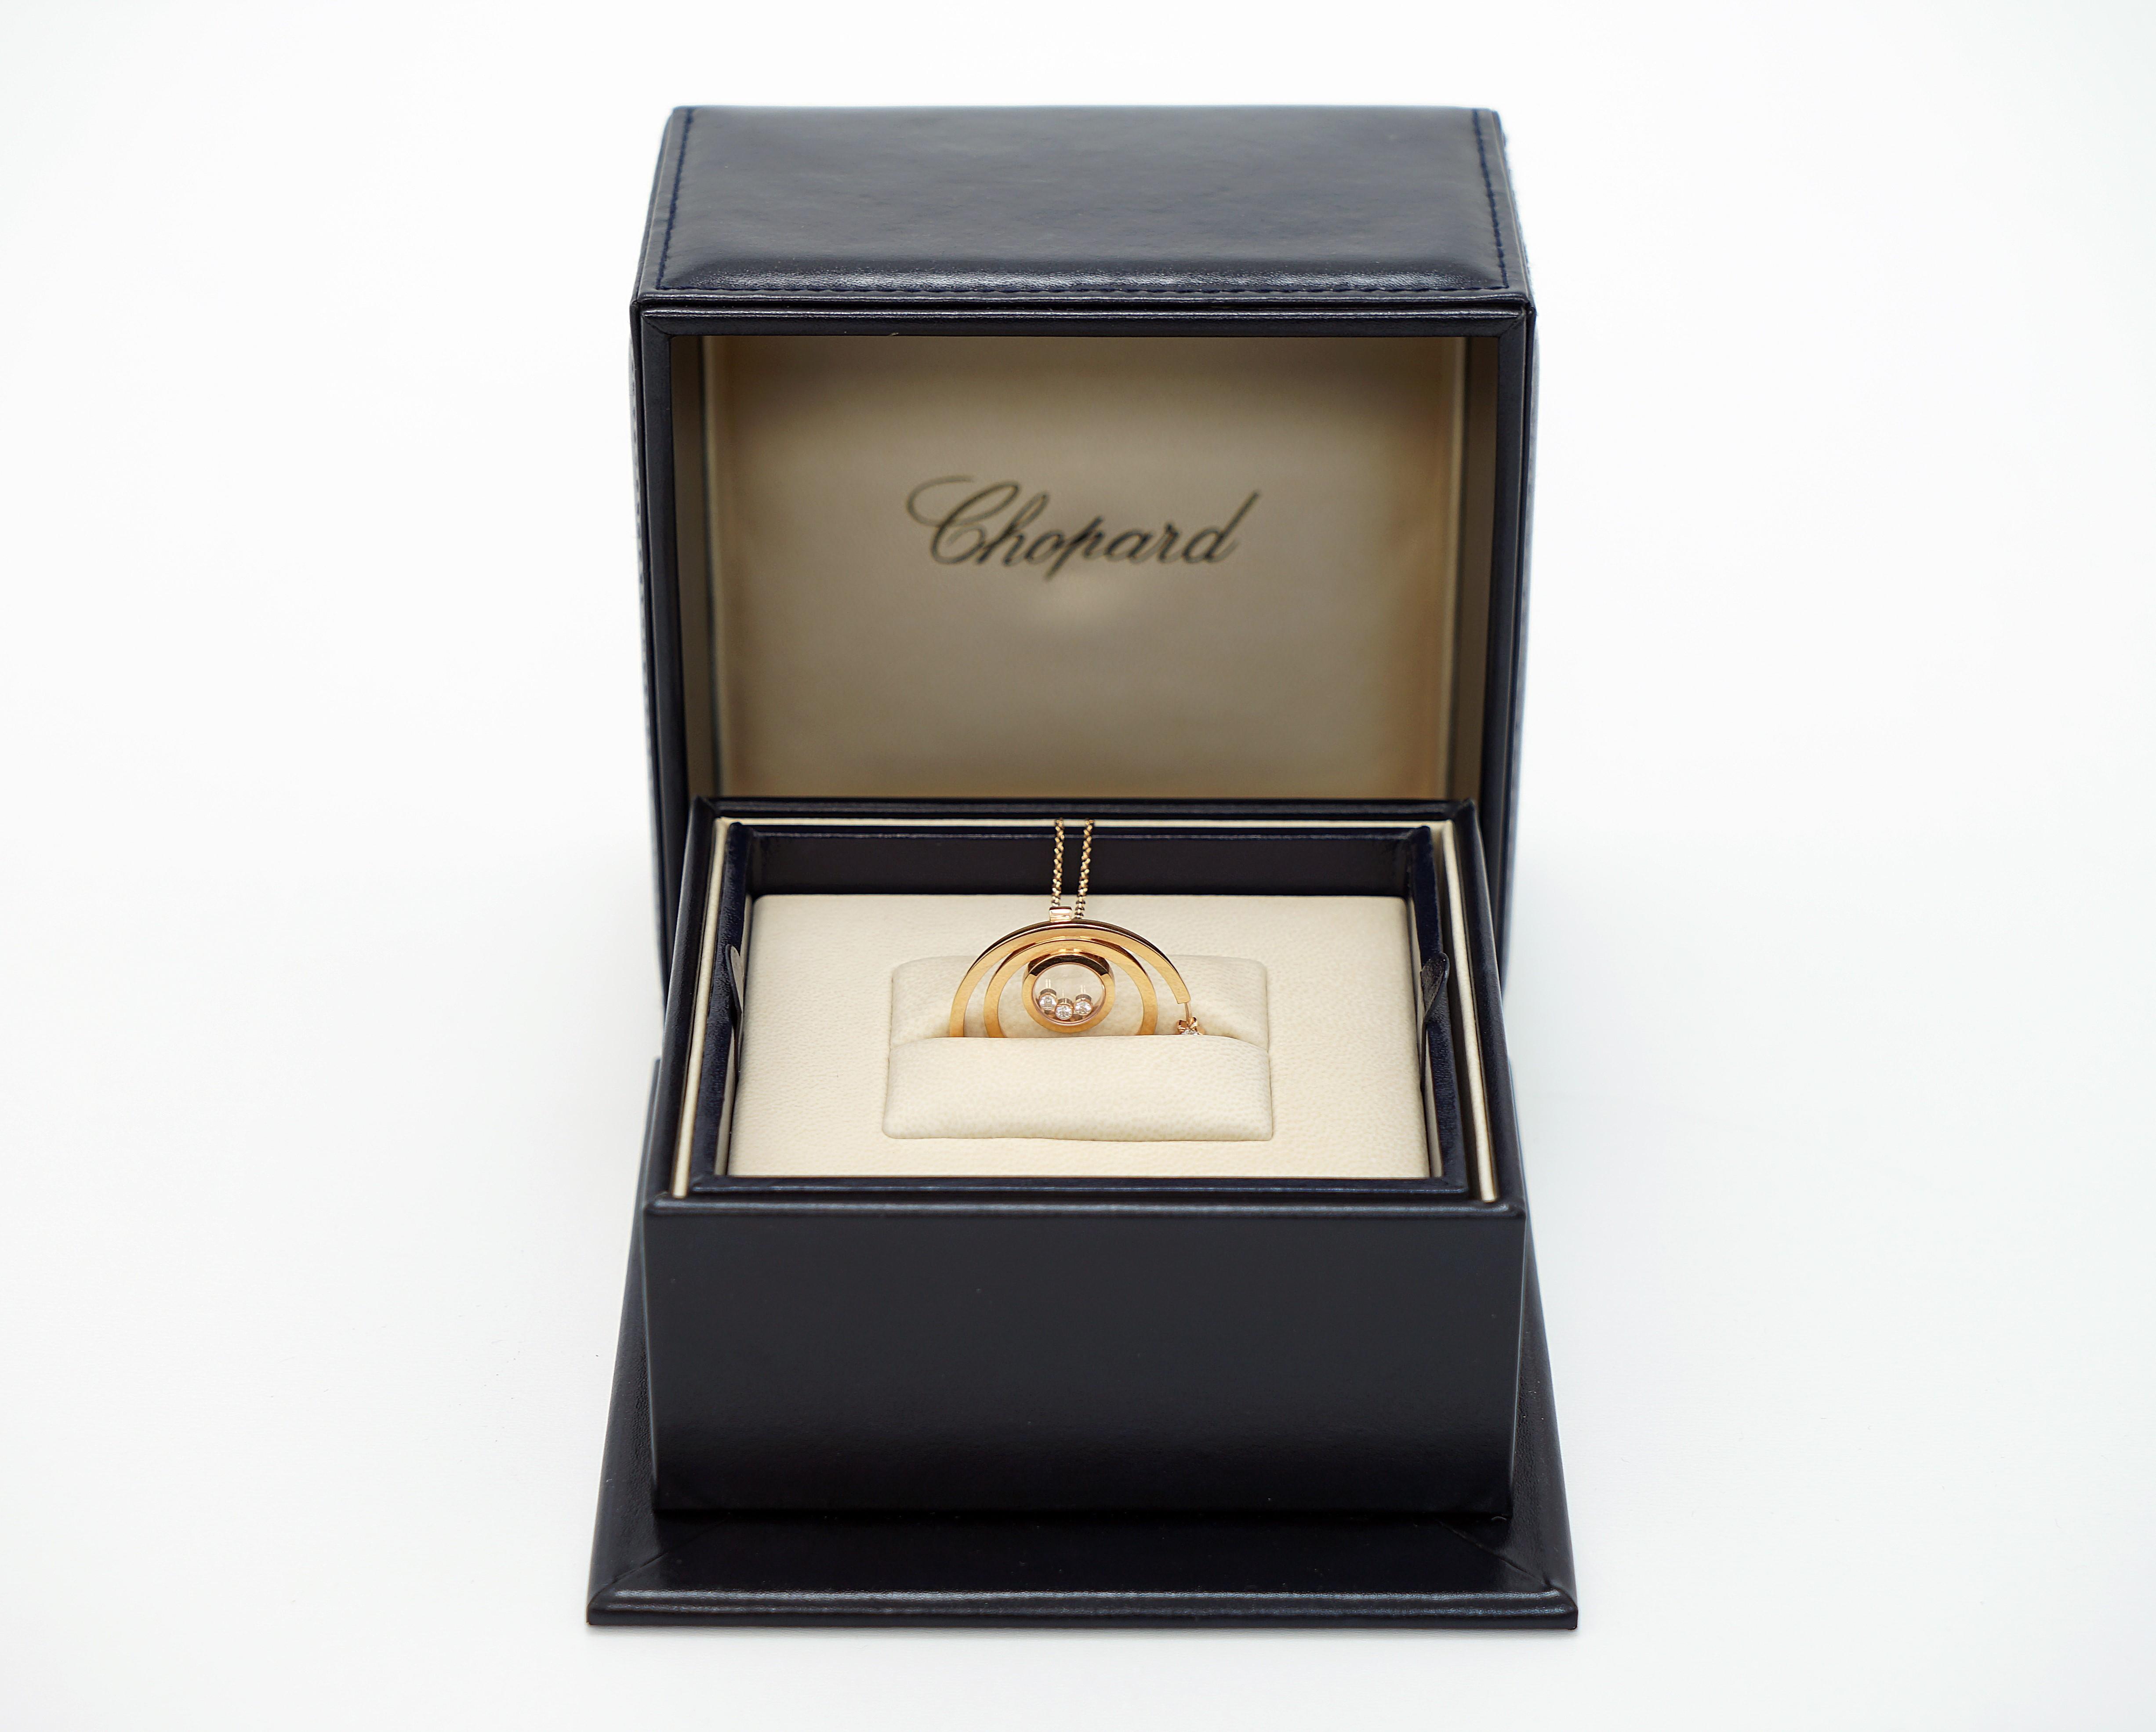 A Lady's Chopard 18K Rose Gold , Happy Diamonds pendant - Image 2 of 9